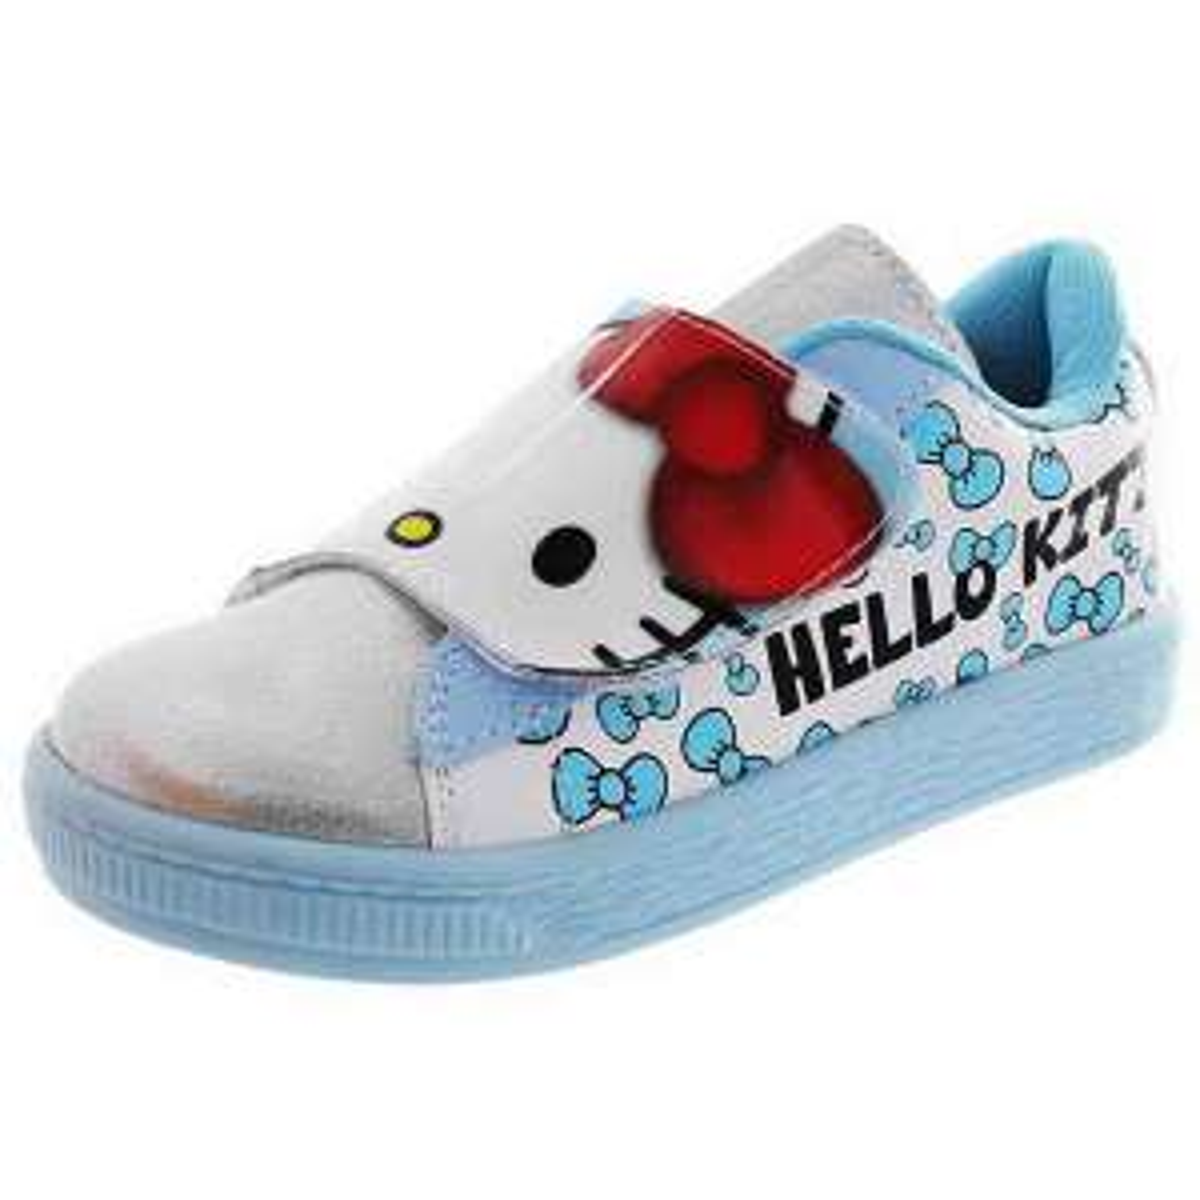 Sears: Tennis Hello Kitty niña talla 17-21